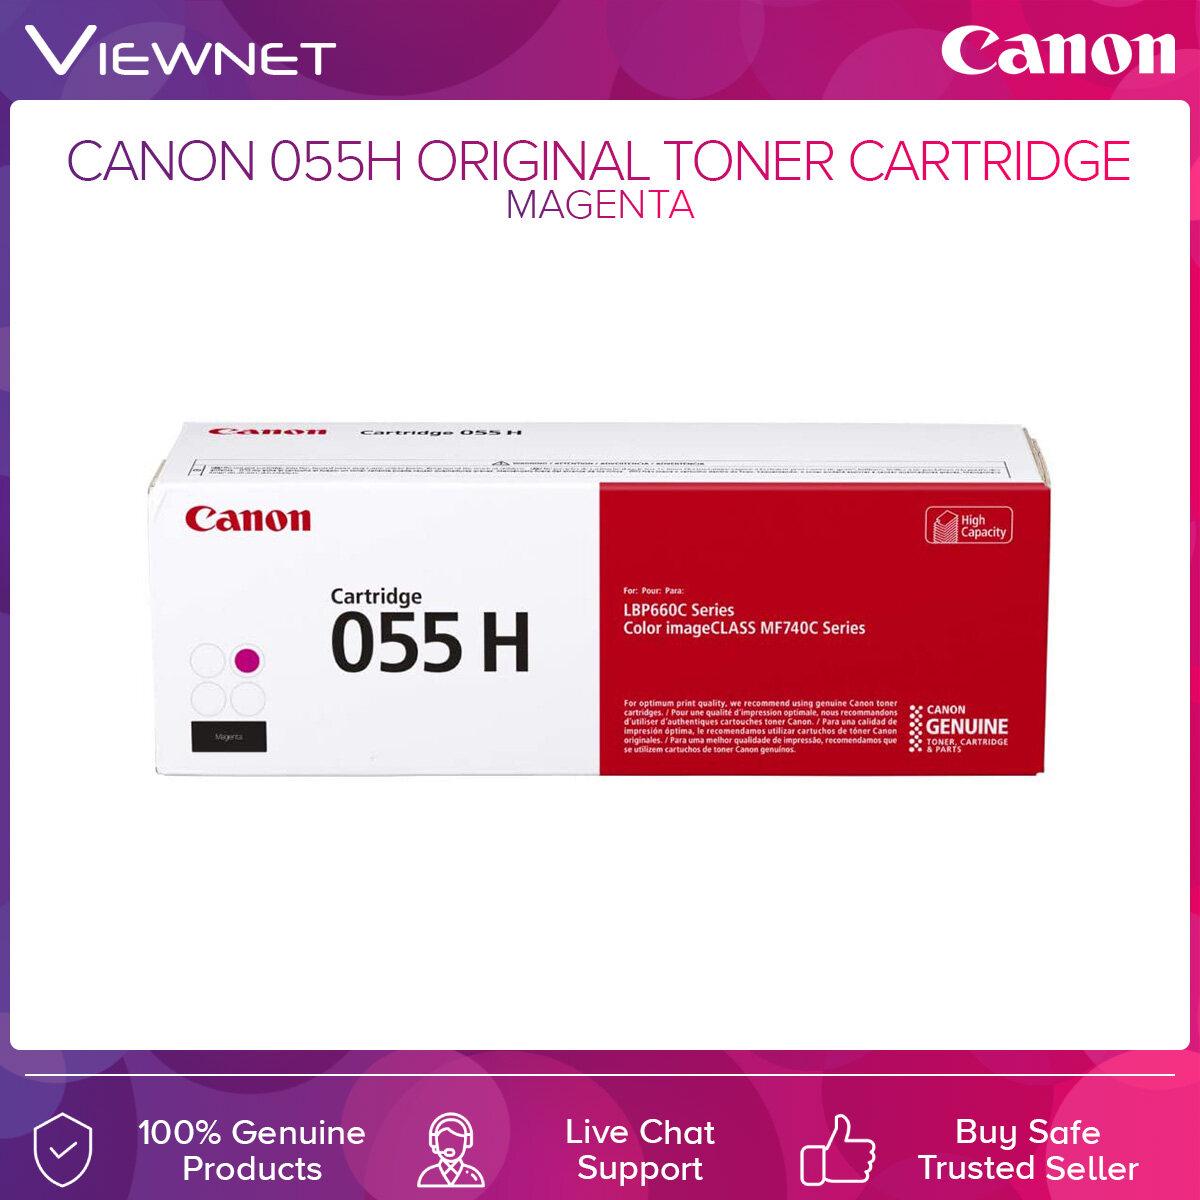 Canon 055H Original Toner Cartridge Black  Cyan  Magenta  Yellow